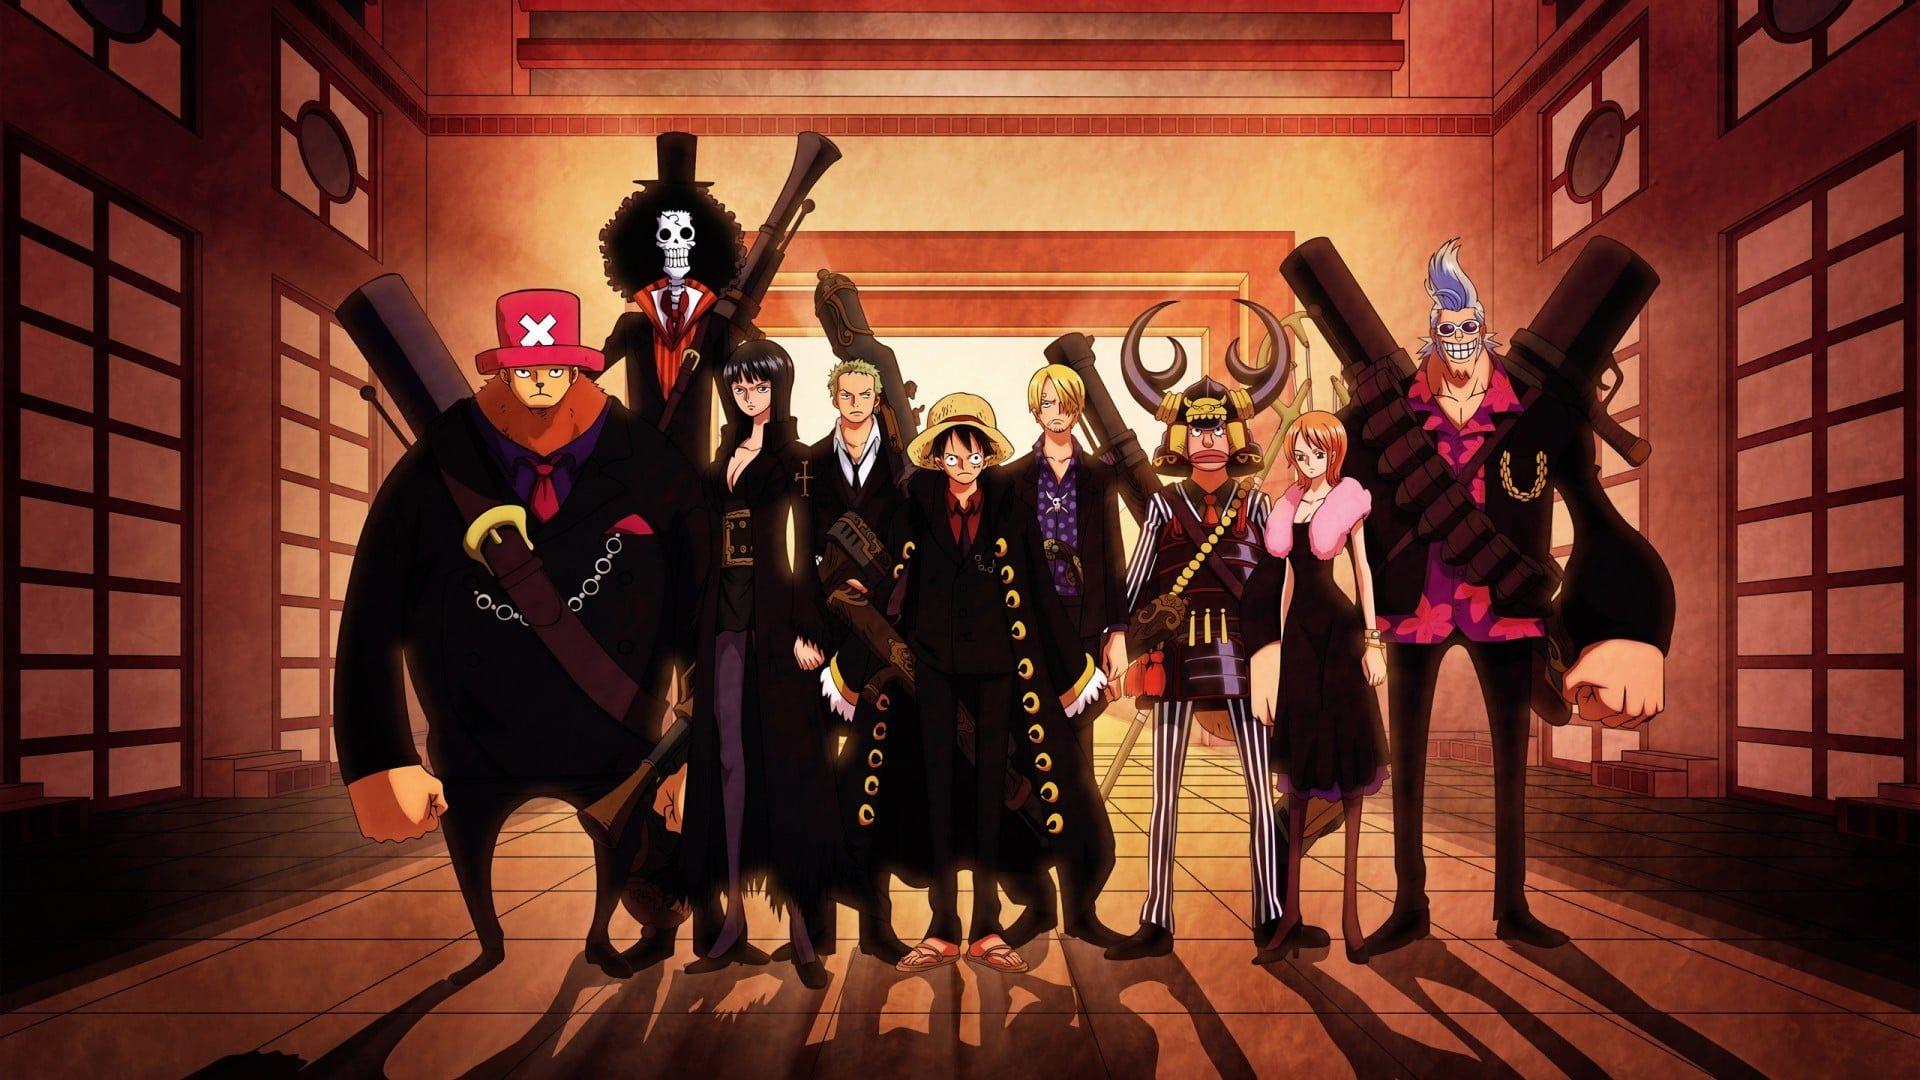 One Piece Photos On Desktop, Movie 10